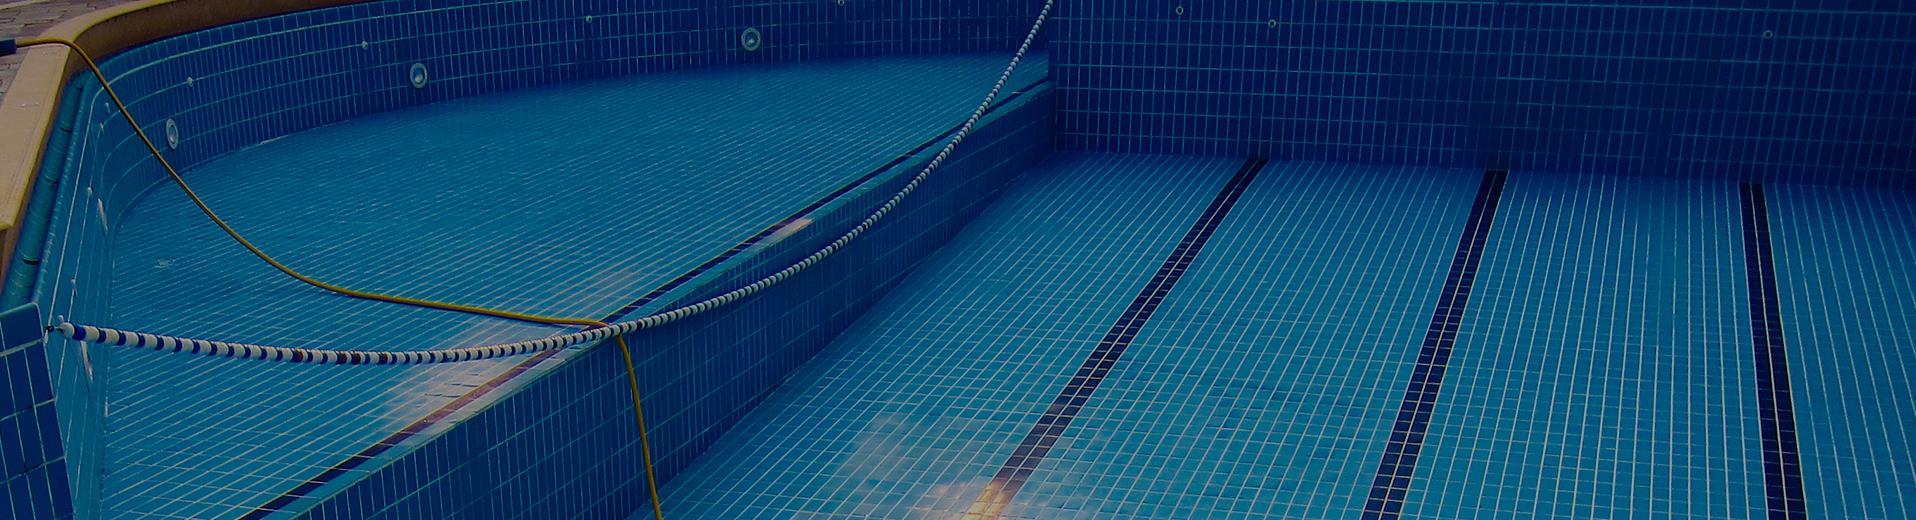 about-perth-fibreglass-pool-renovations-and-resurfacing